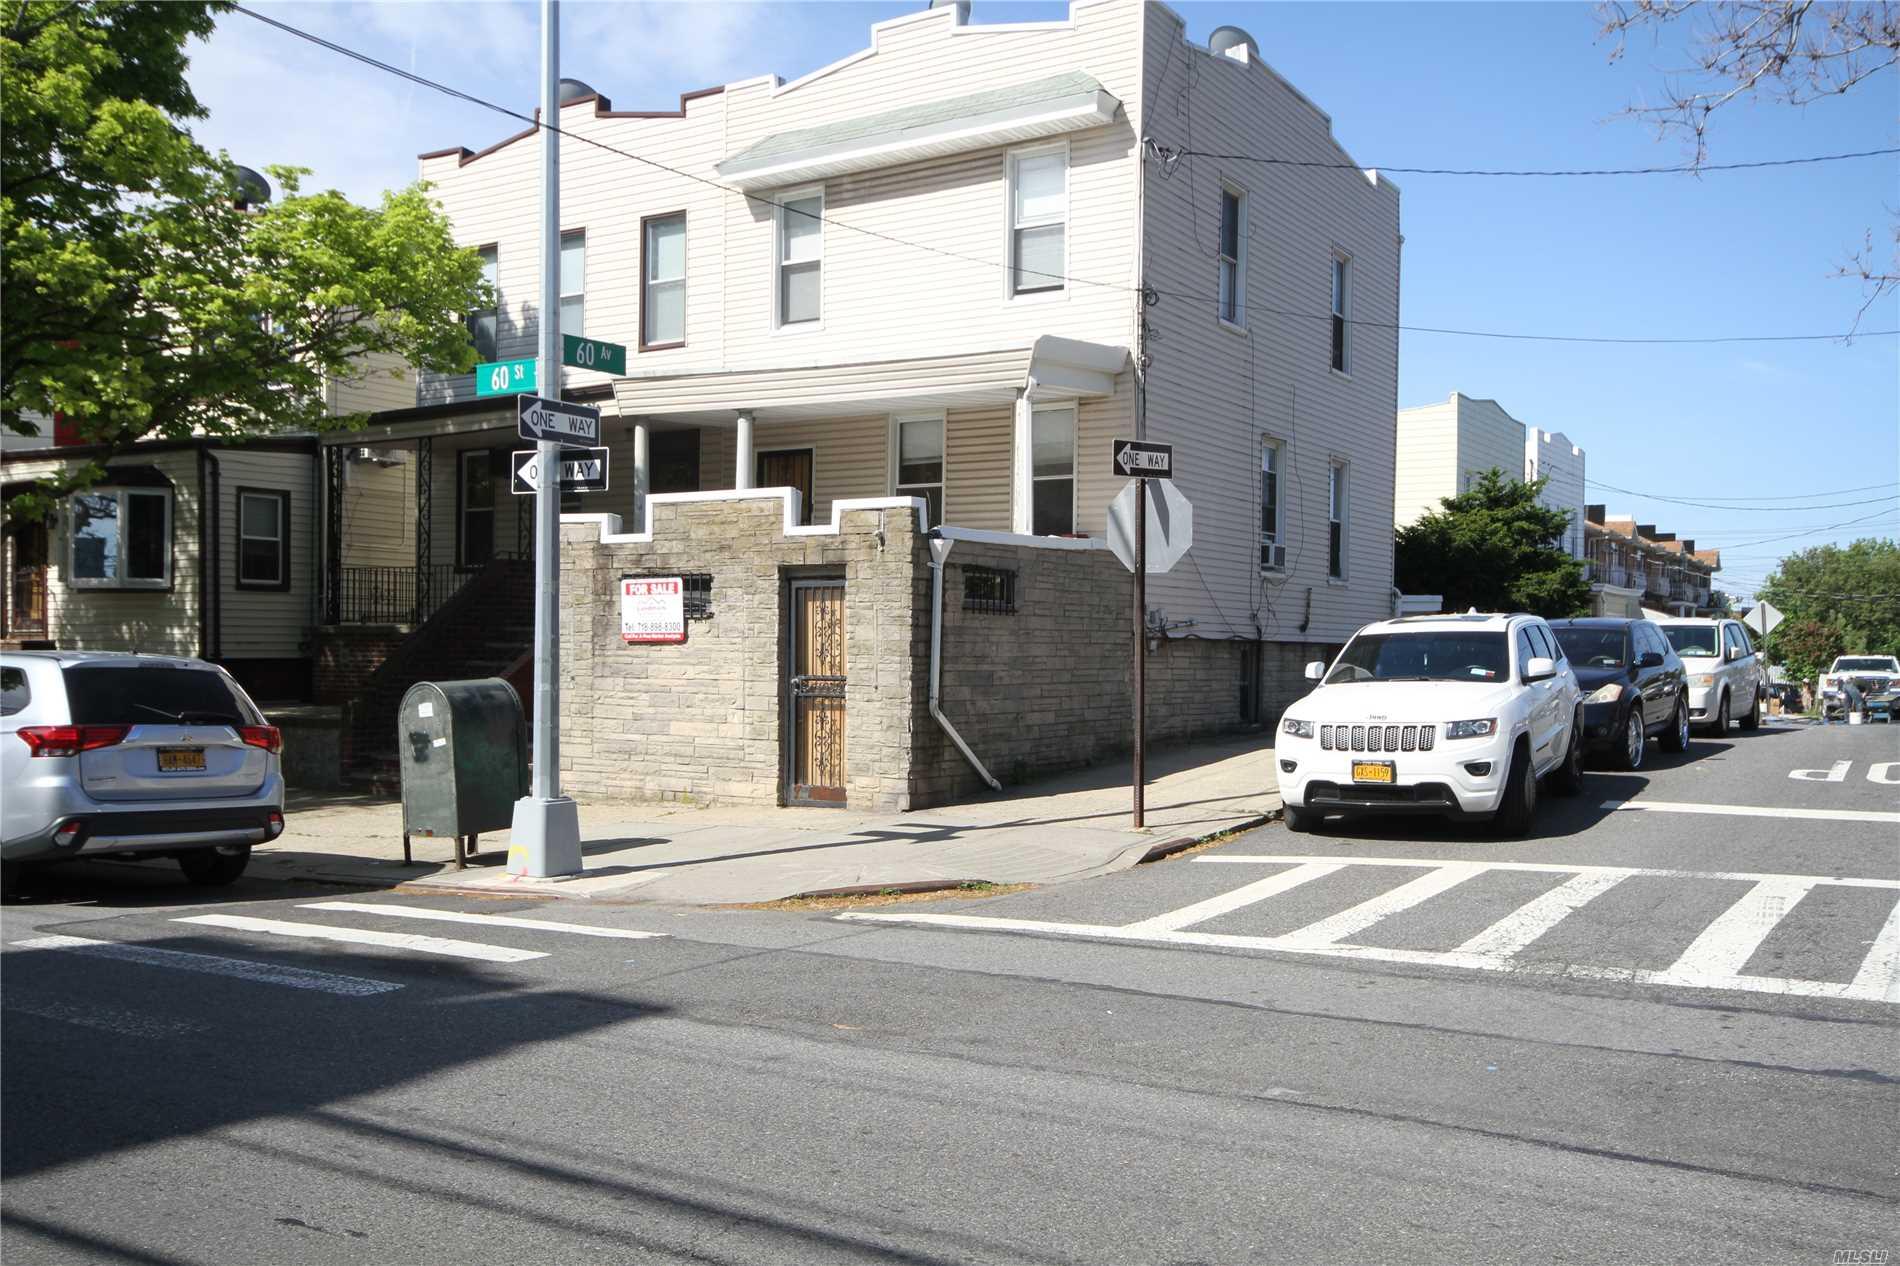 Property for sale at 60-02 60th Street, Maspeth NY 11378, Maspeth,  New York 11378